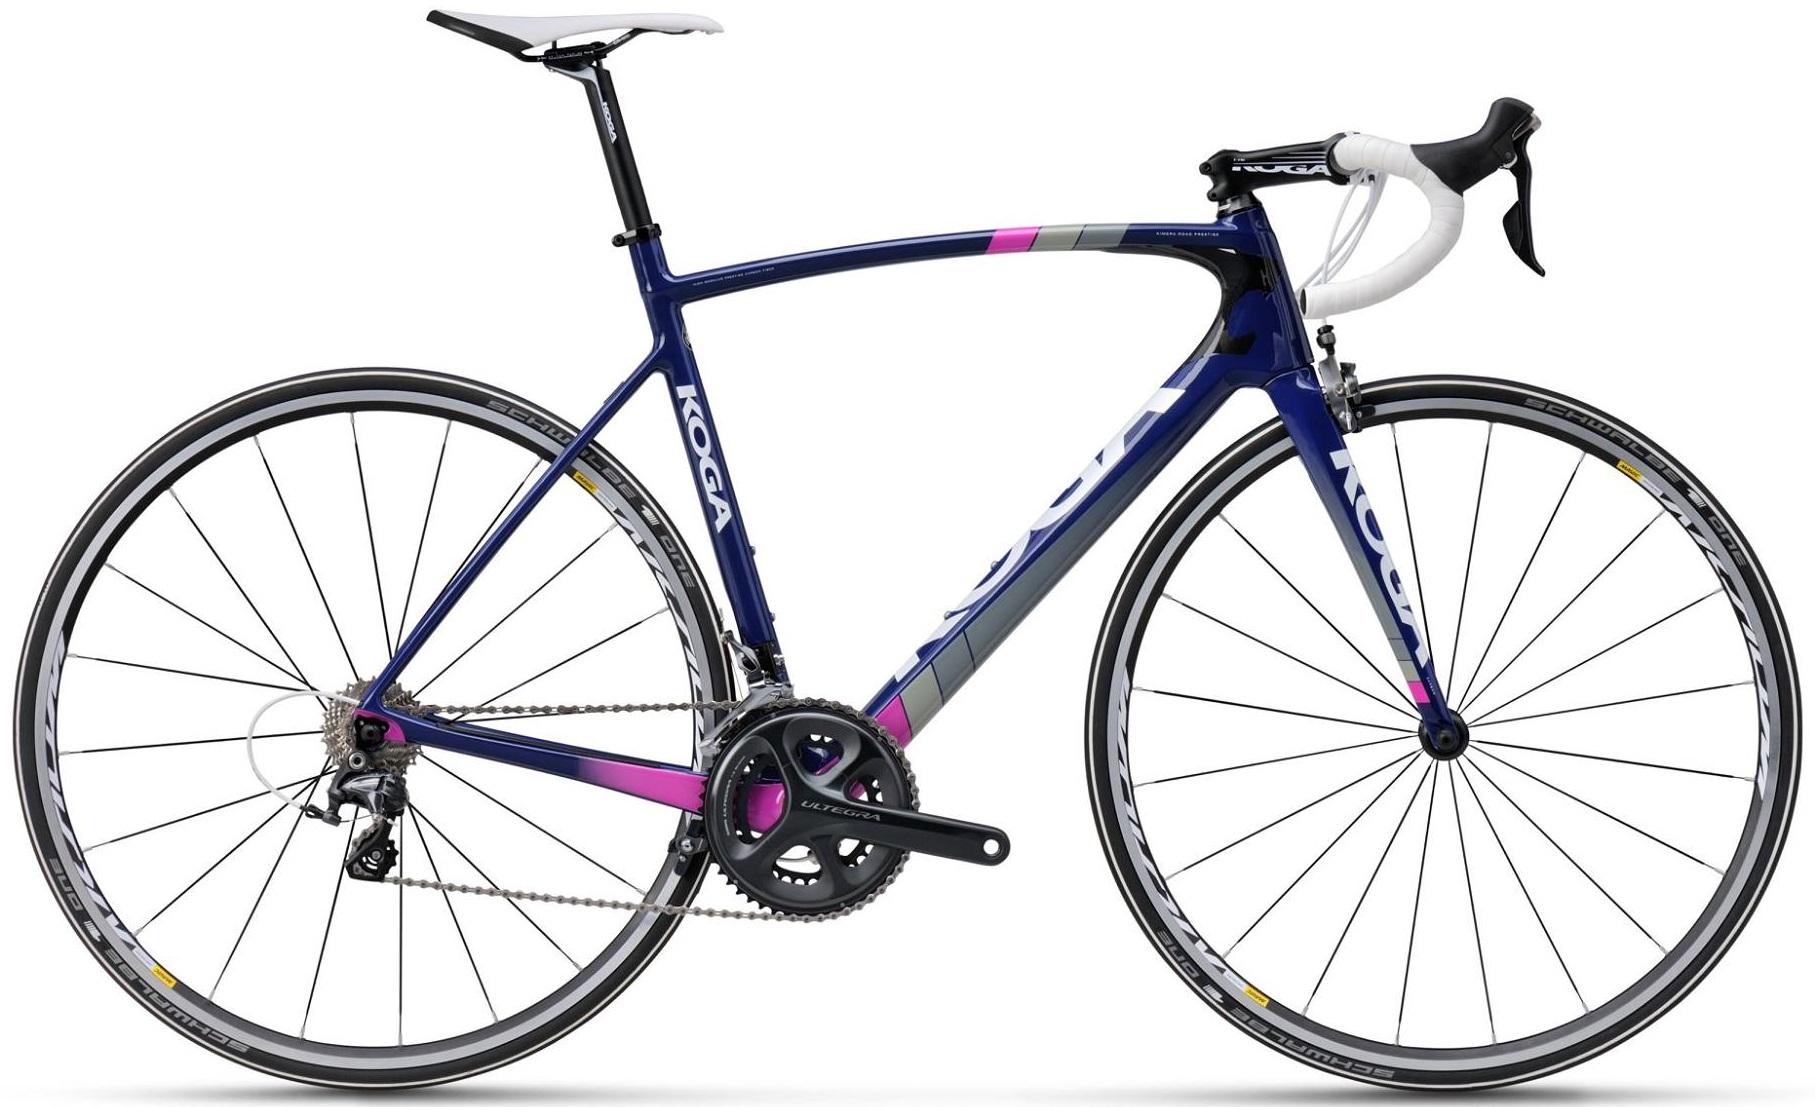 2016 Koga Kimera Prestige blue purple ultegraneuroticarnutz2016 Koga Kimera Prestige blue purple ultegra2015 Merida Scultura 7000 Ultegra di2 light blue black